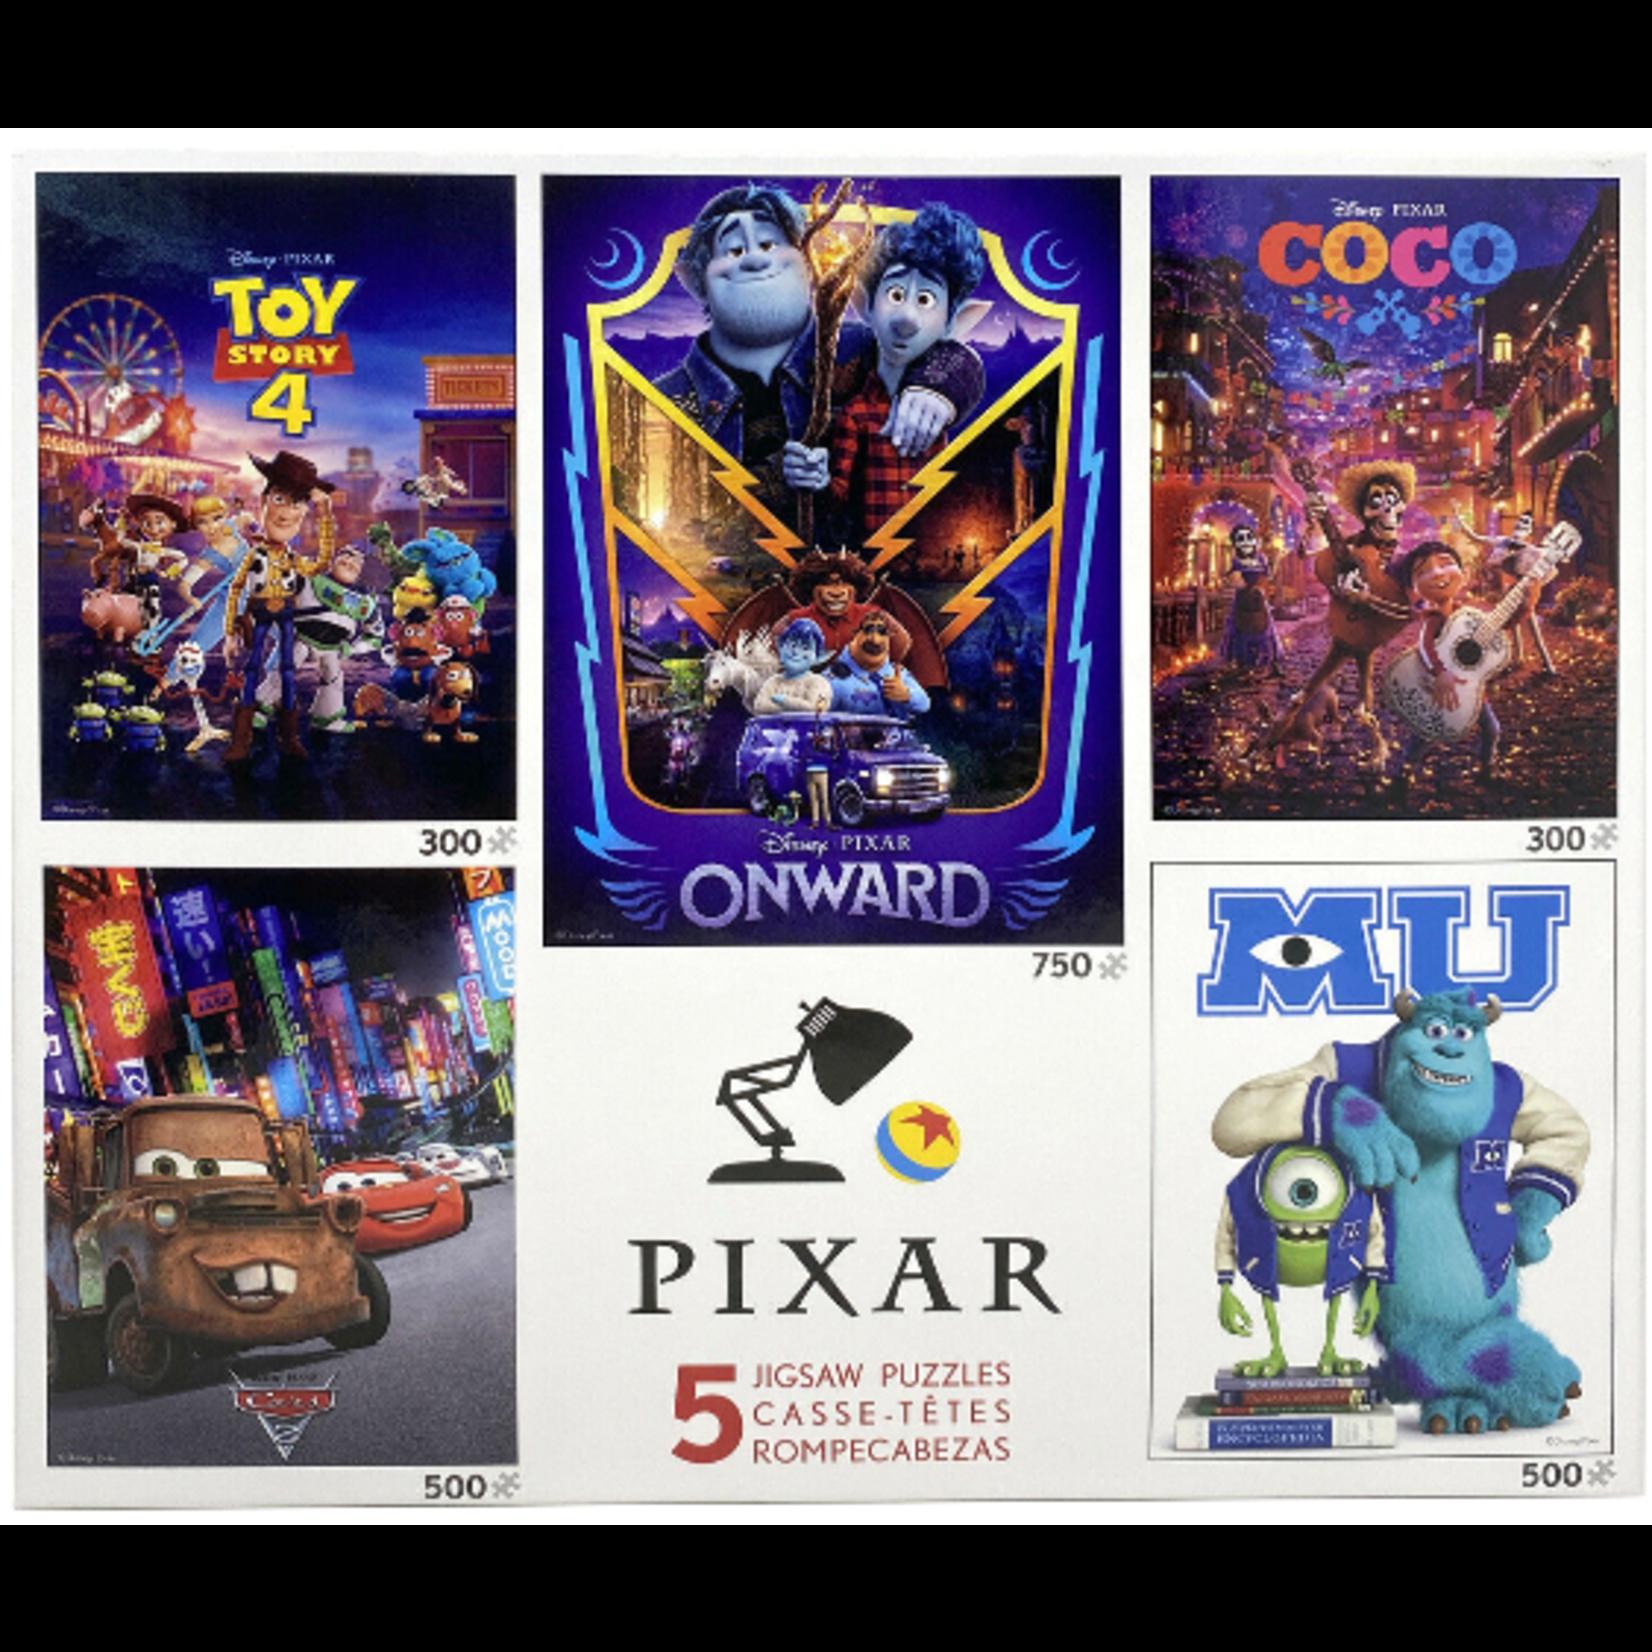 ceaco Ceaco - Pixar 5 in 1 Multipack Jigsaw Puzzle